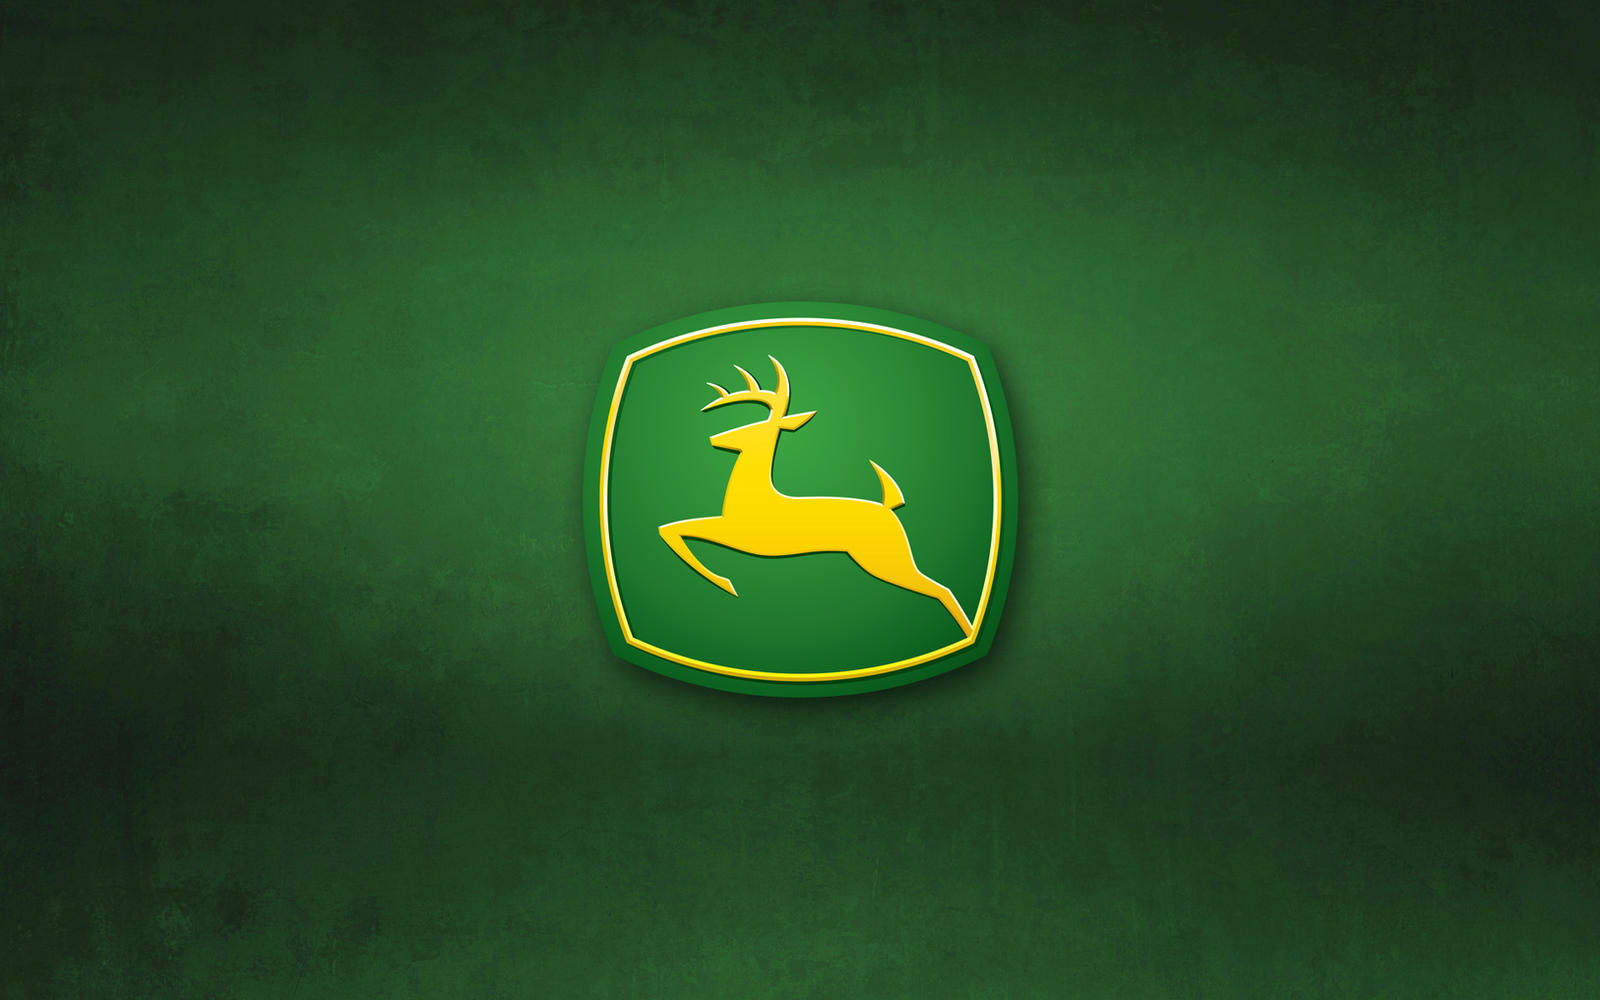 john deere logo desktop wallpaper